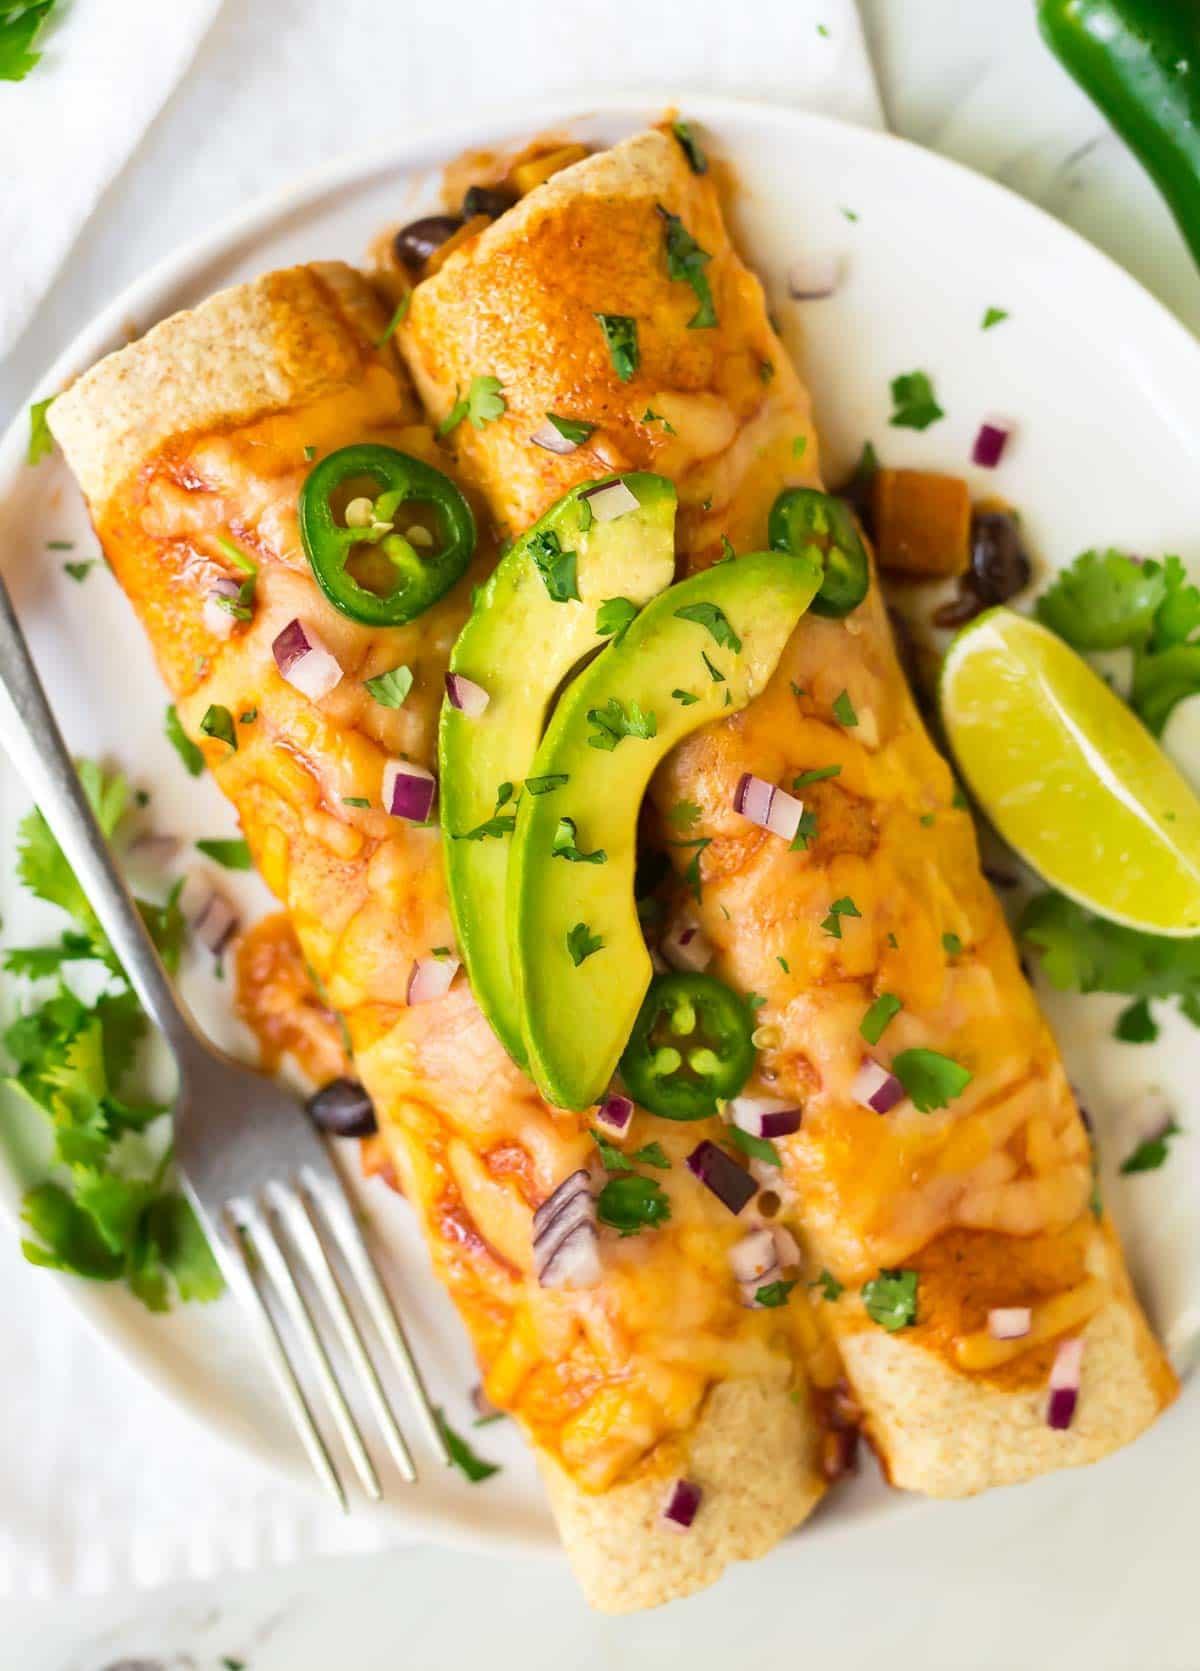 Vegetarian Enchiladas Easy To Make Ahead Wellplated Com